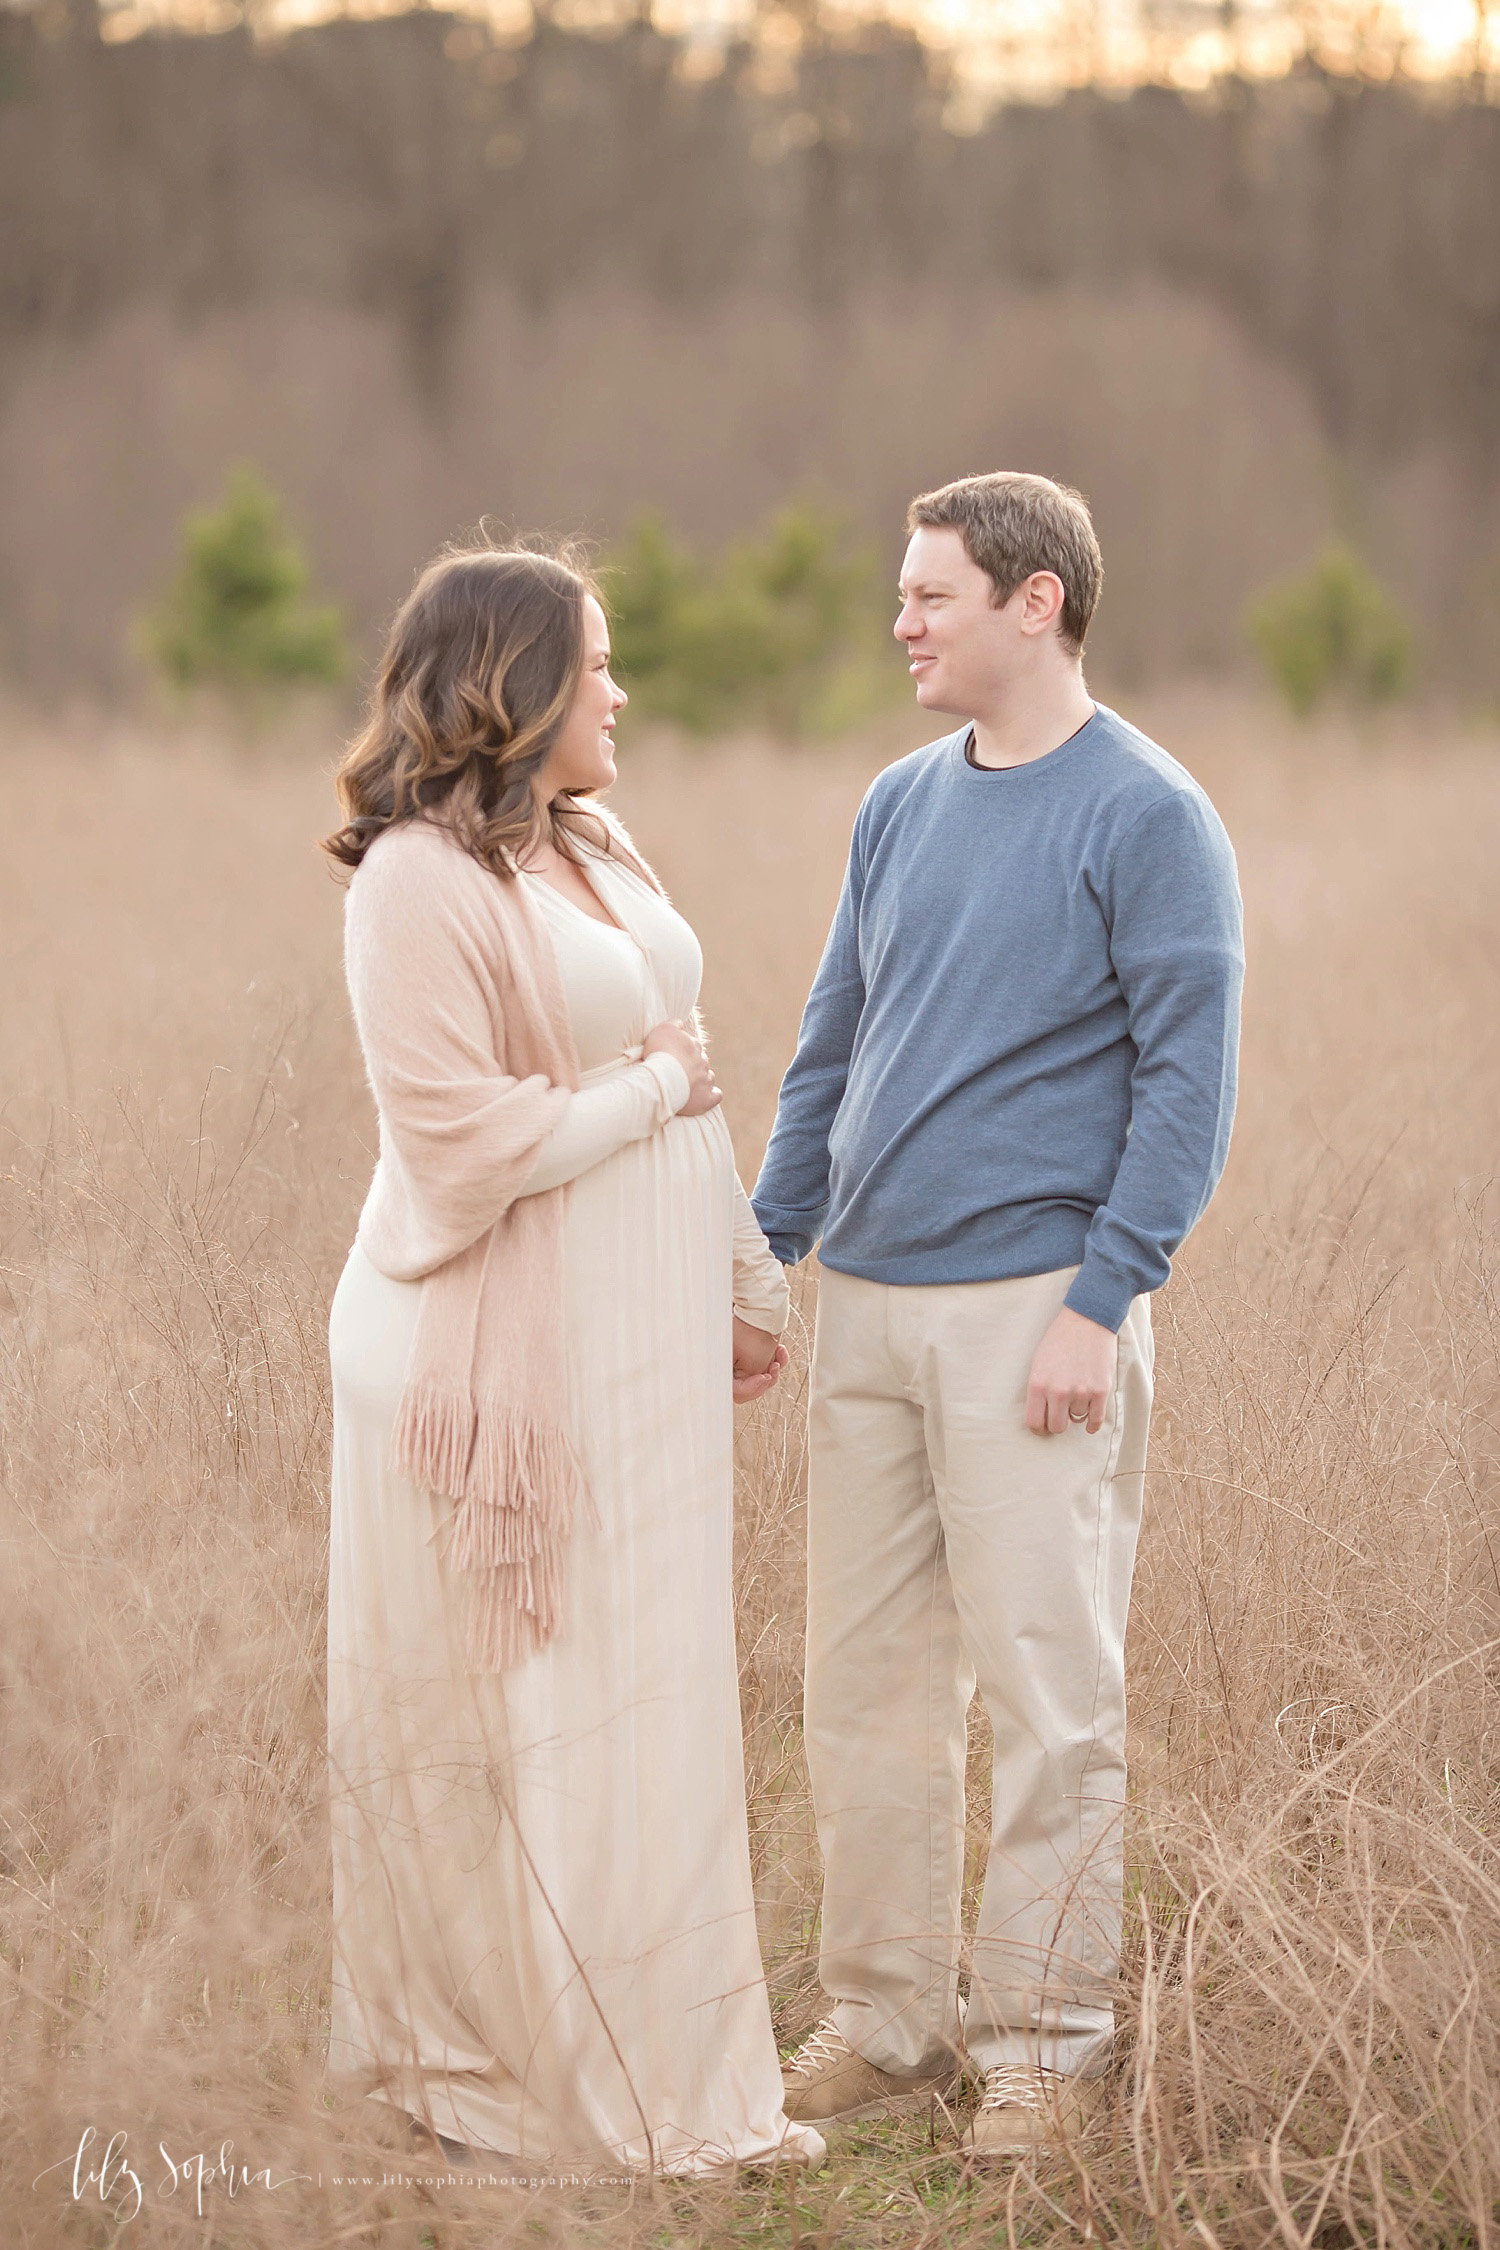 intown-atlanta-georga-natural-light-maternity-photographer-pregnancy-session-buckhead-couples-roswell-alpharetta-grant-park-decatur